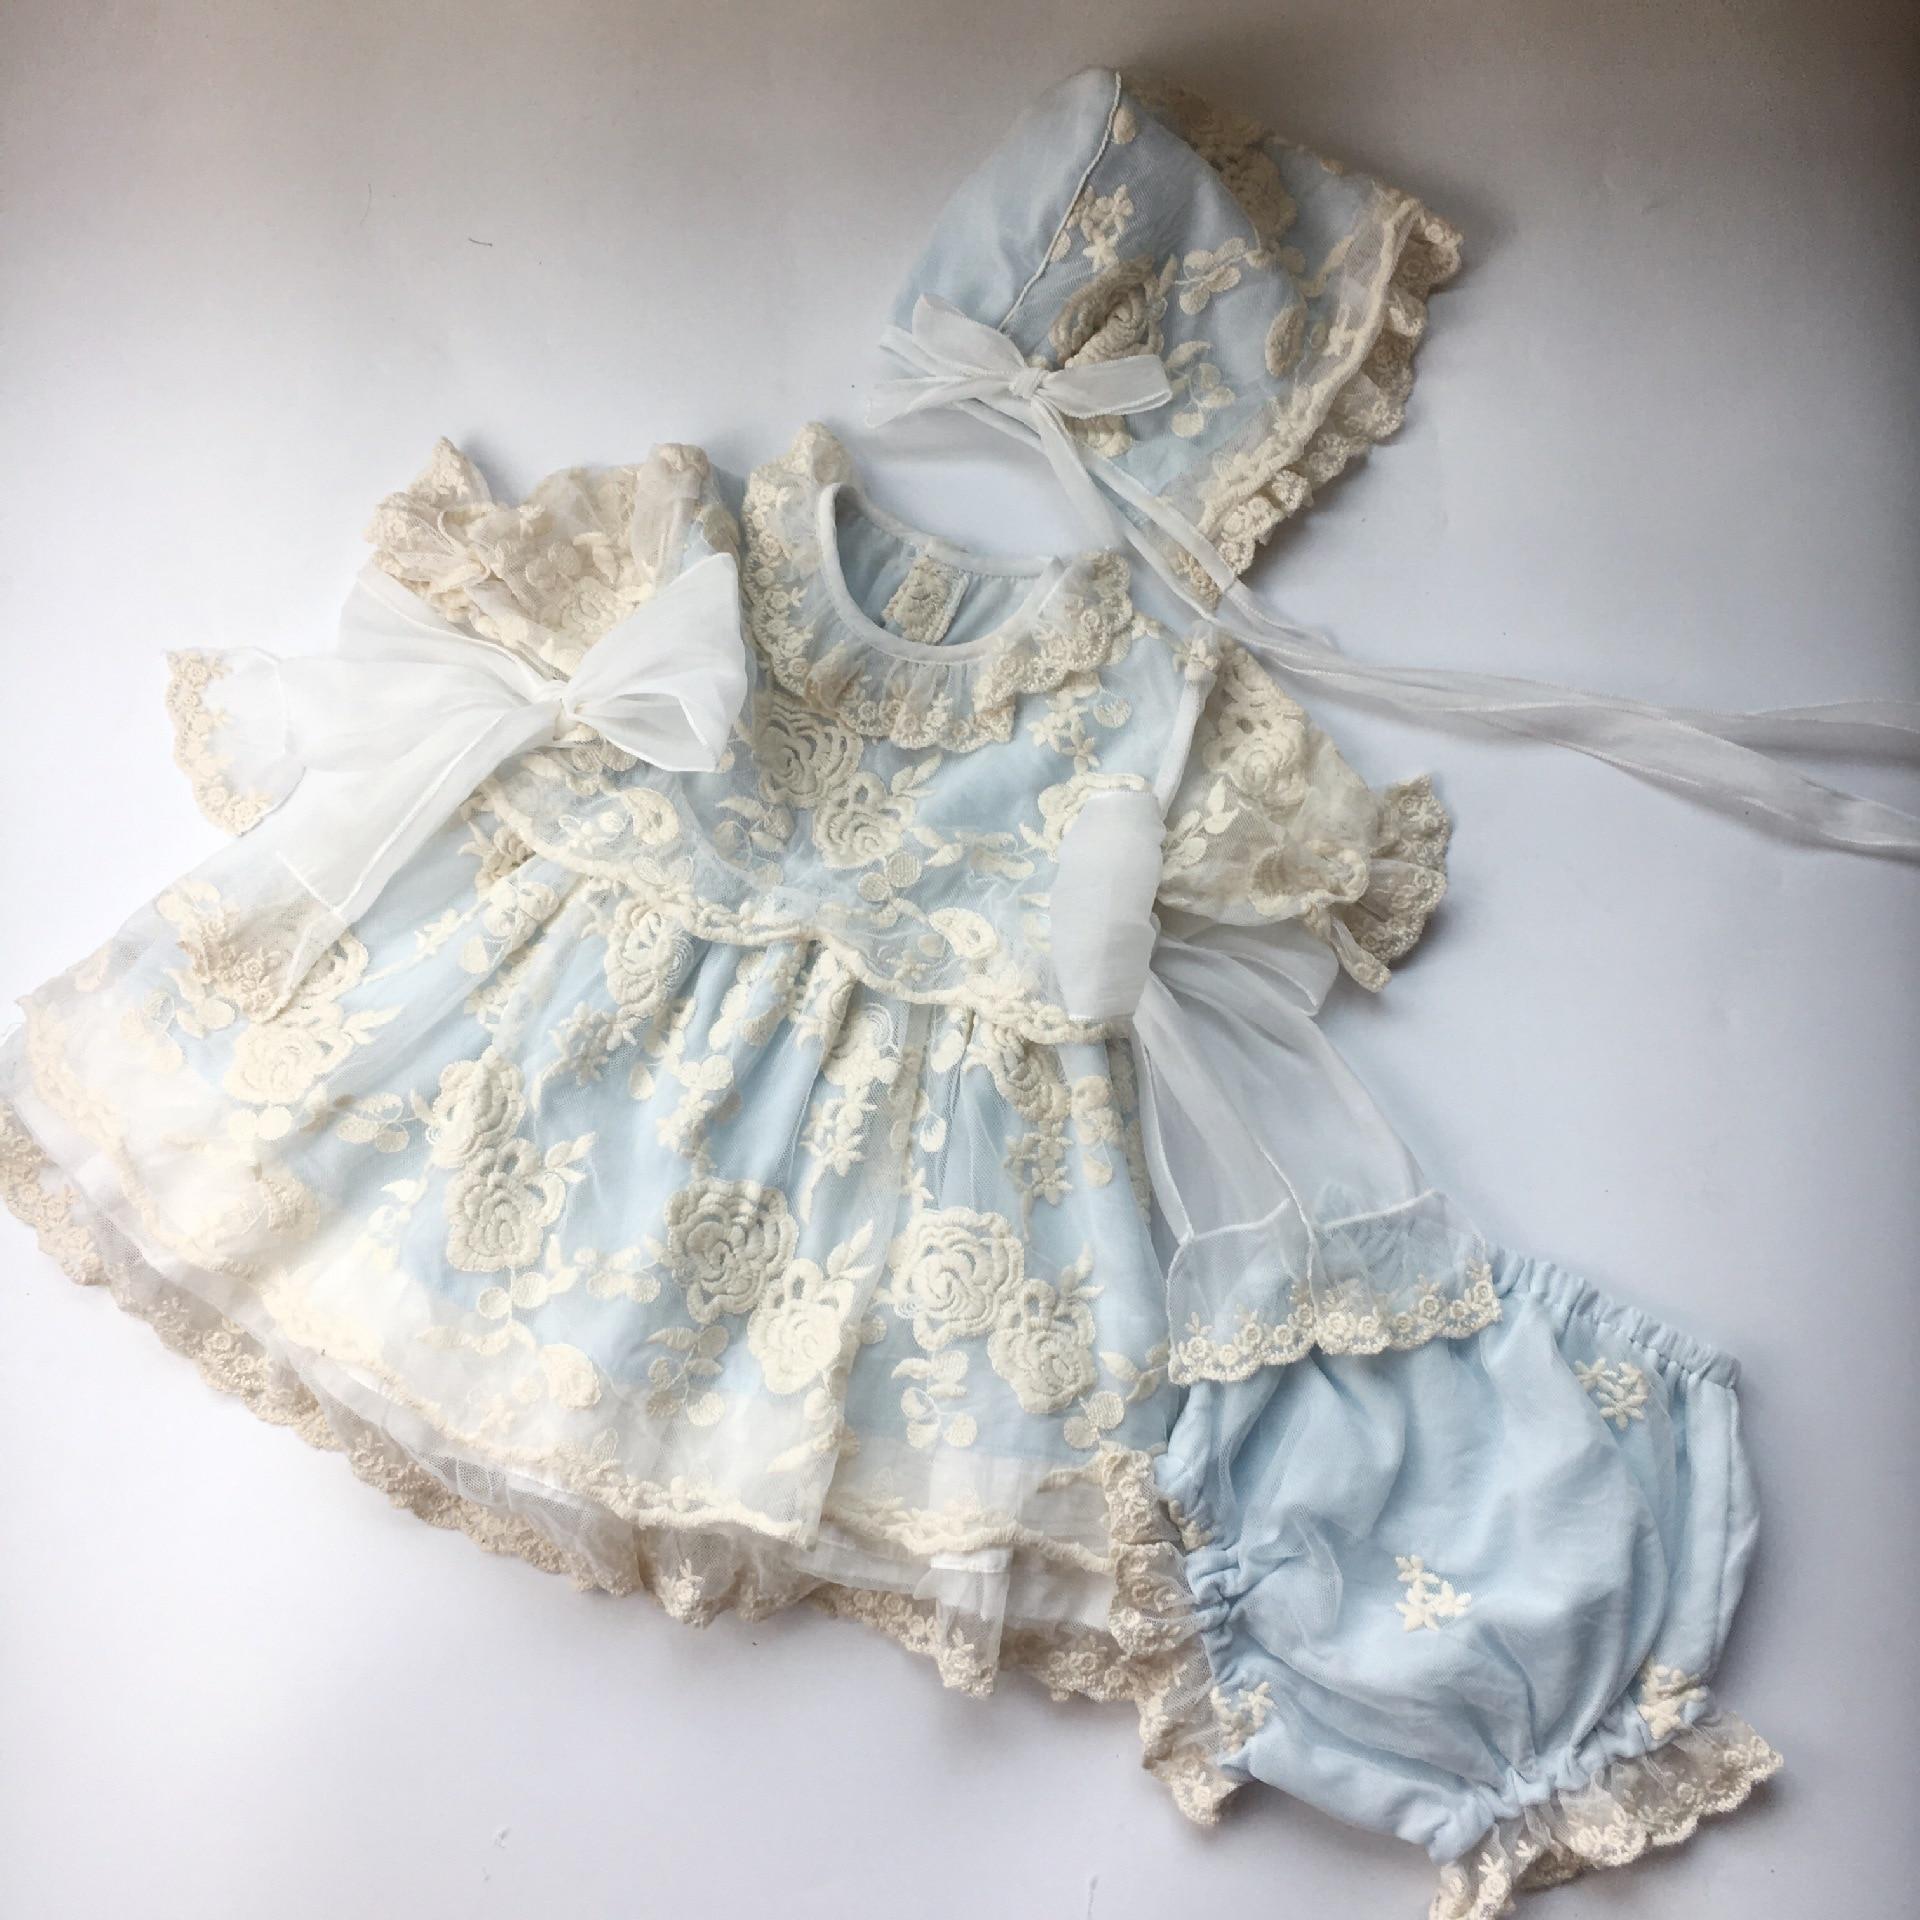 Children s Dresses Girls Boutique Spanish Clothes Set Infant Carnival Costume Eleghant Communion Wedding Party Dress